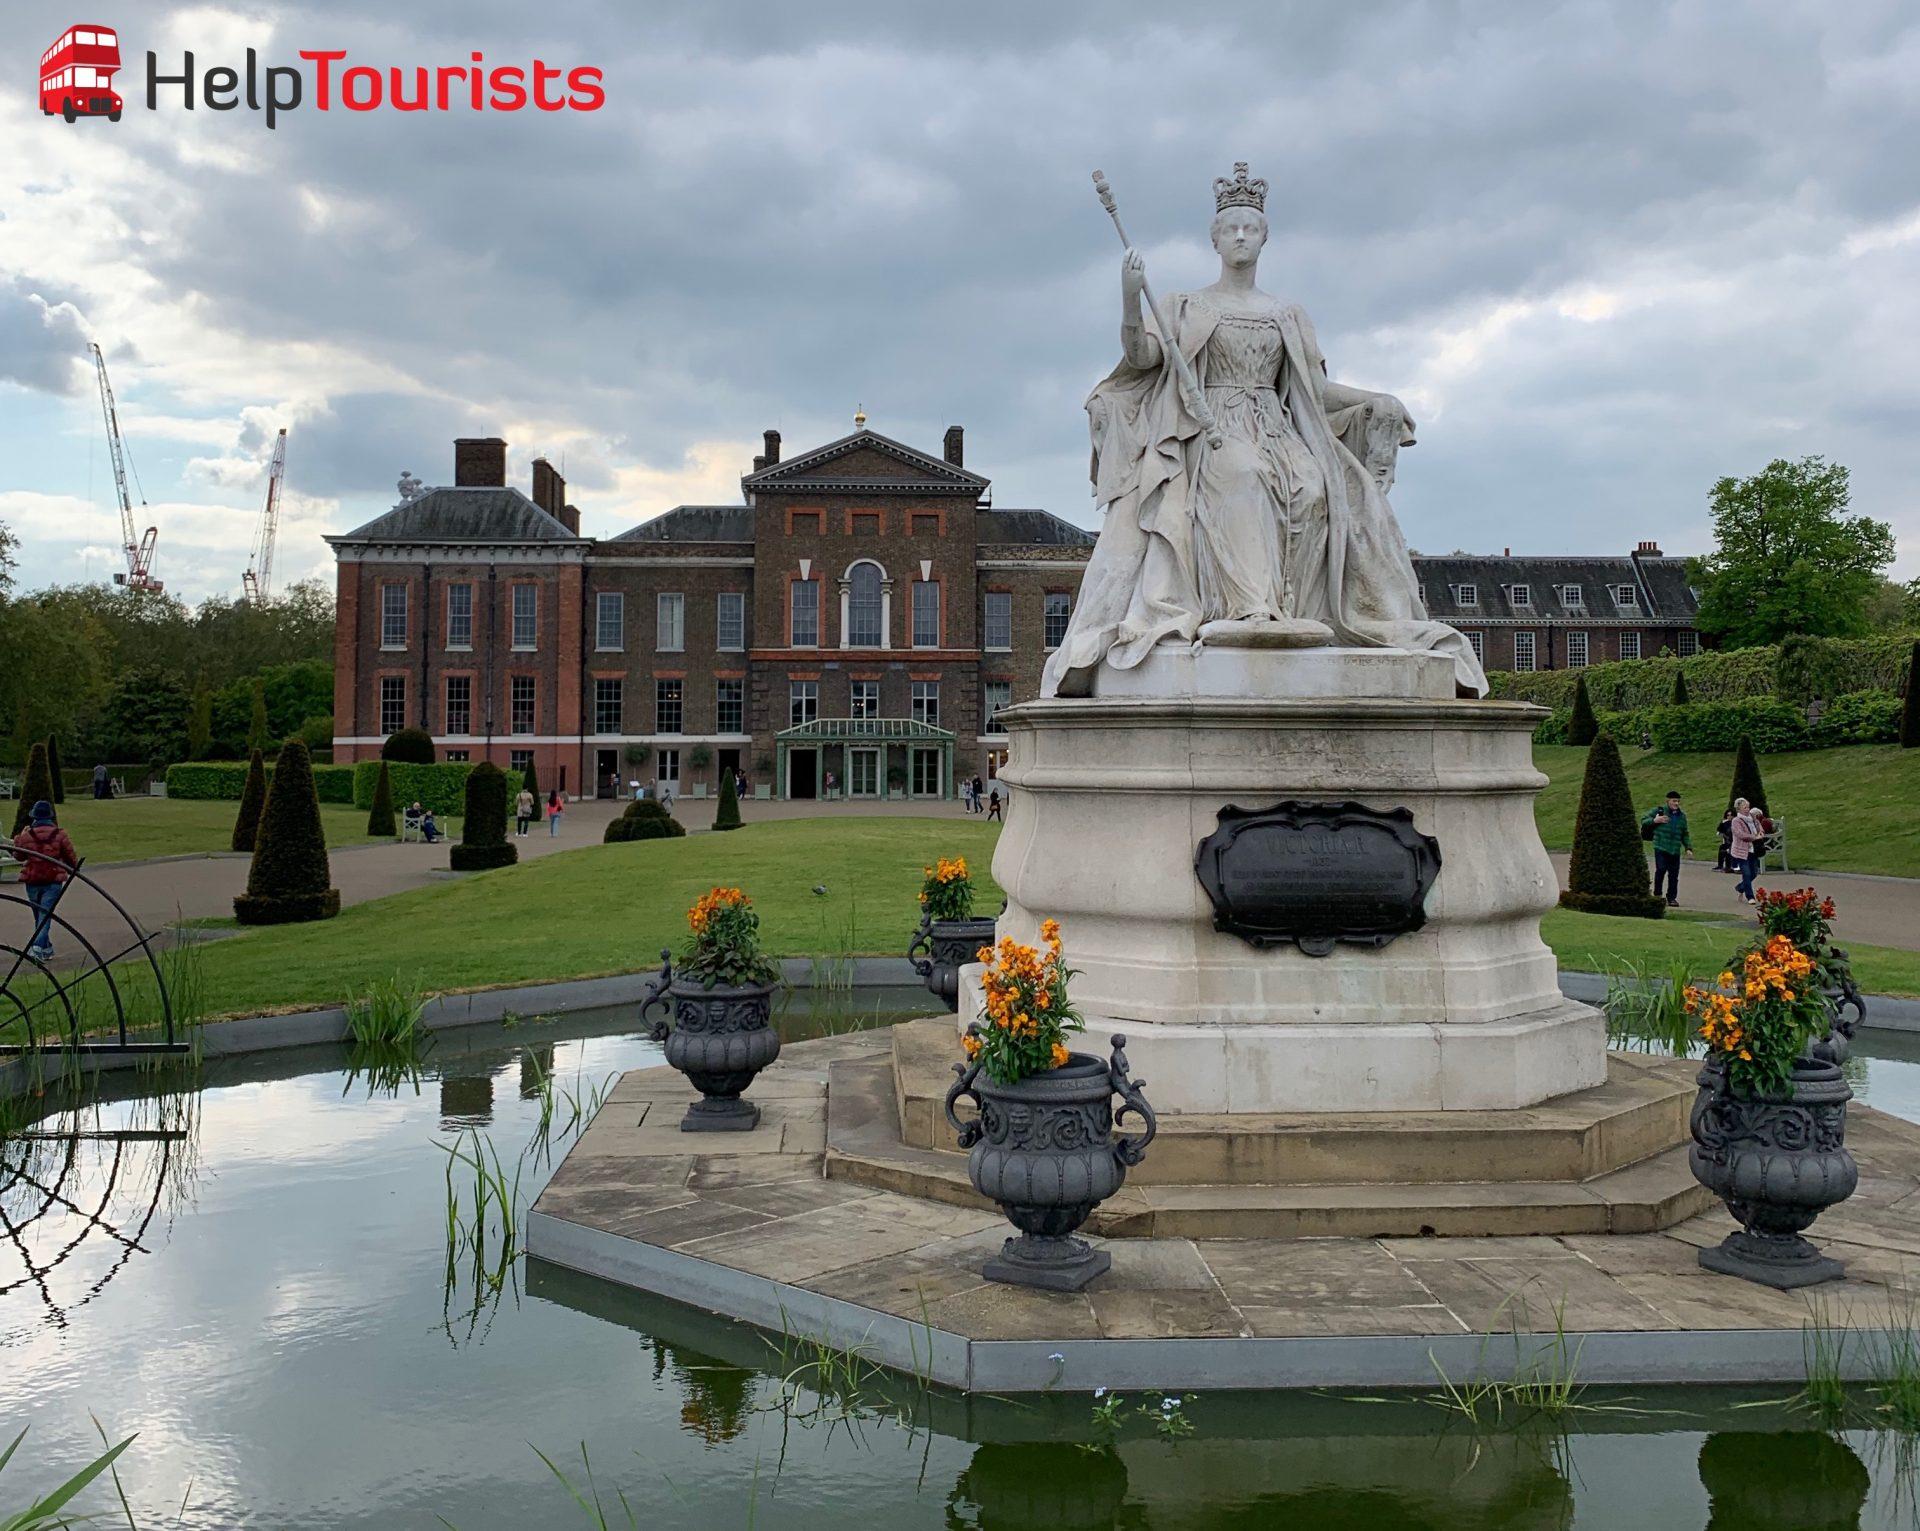 Kensington Palace und Victoria Statue